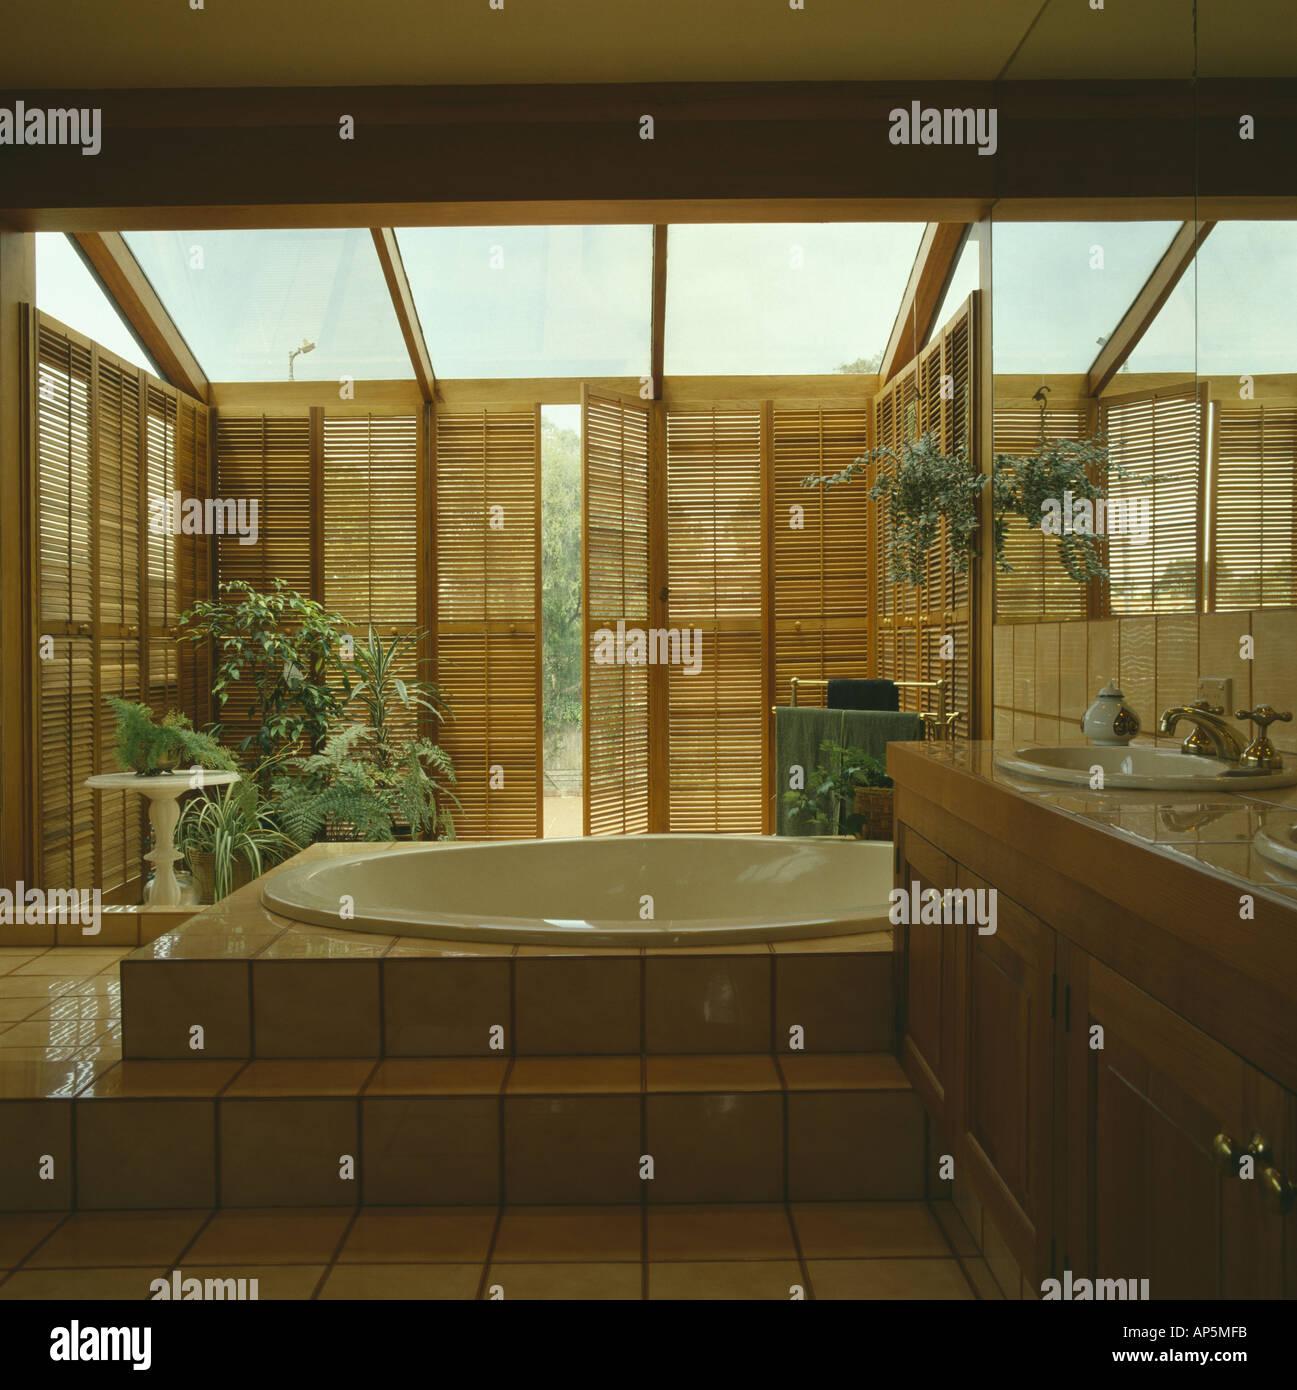 Raised Circular Bath In Modern Bathroom Extension With Plantation Shutters  On Tall Windows